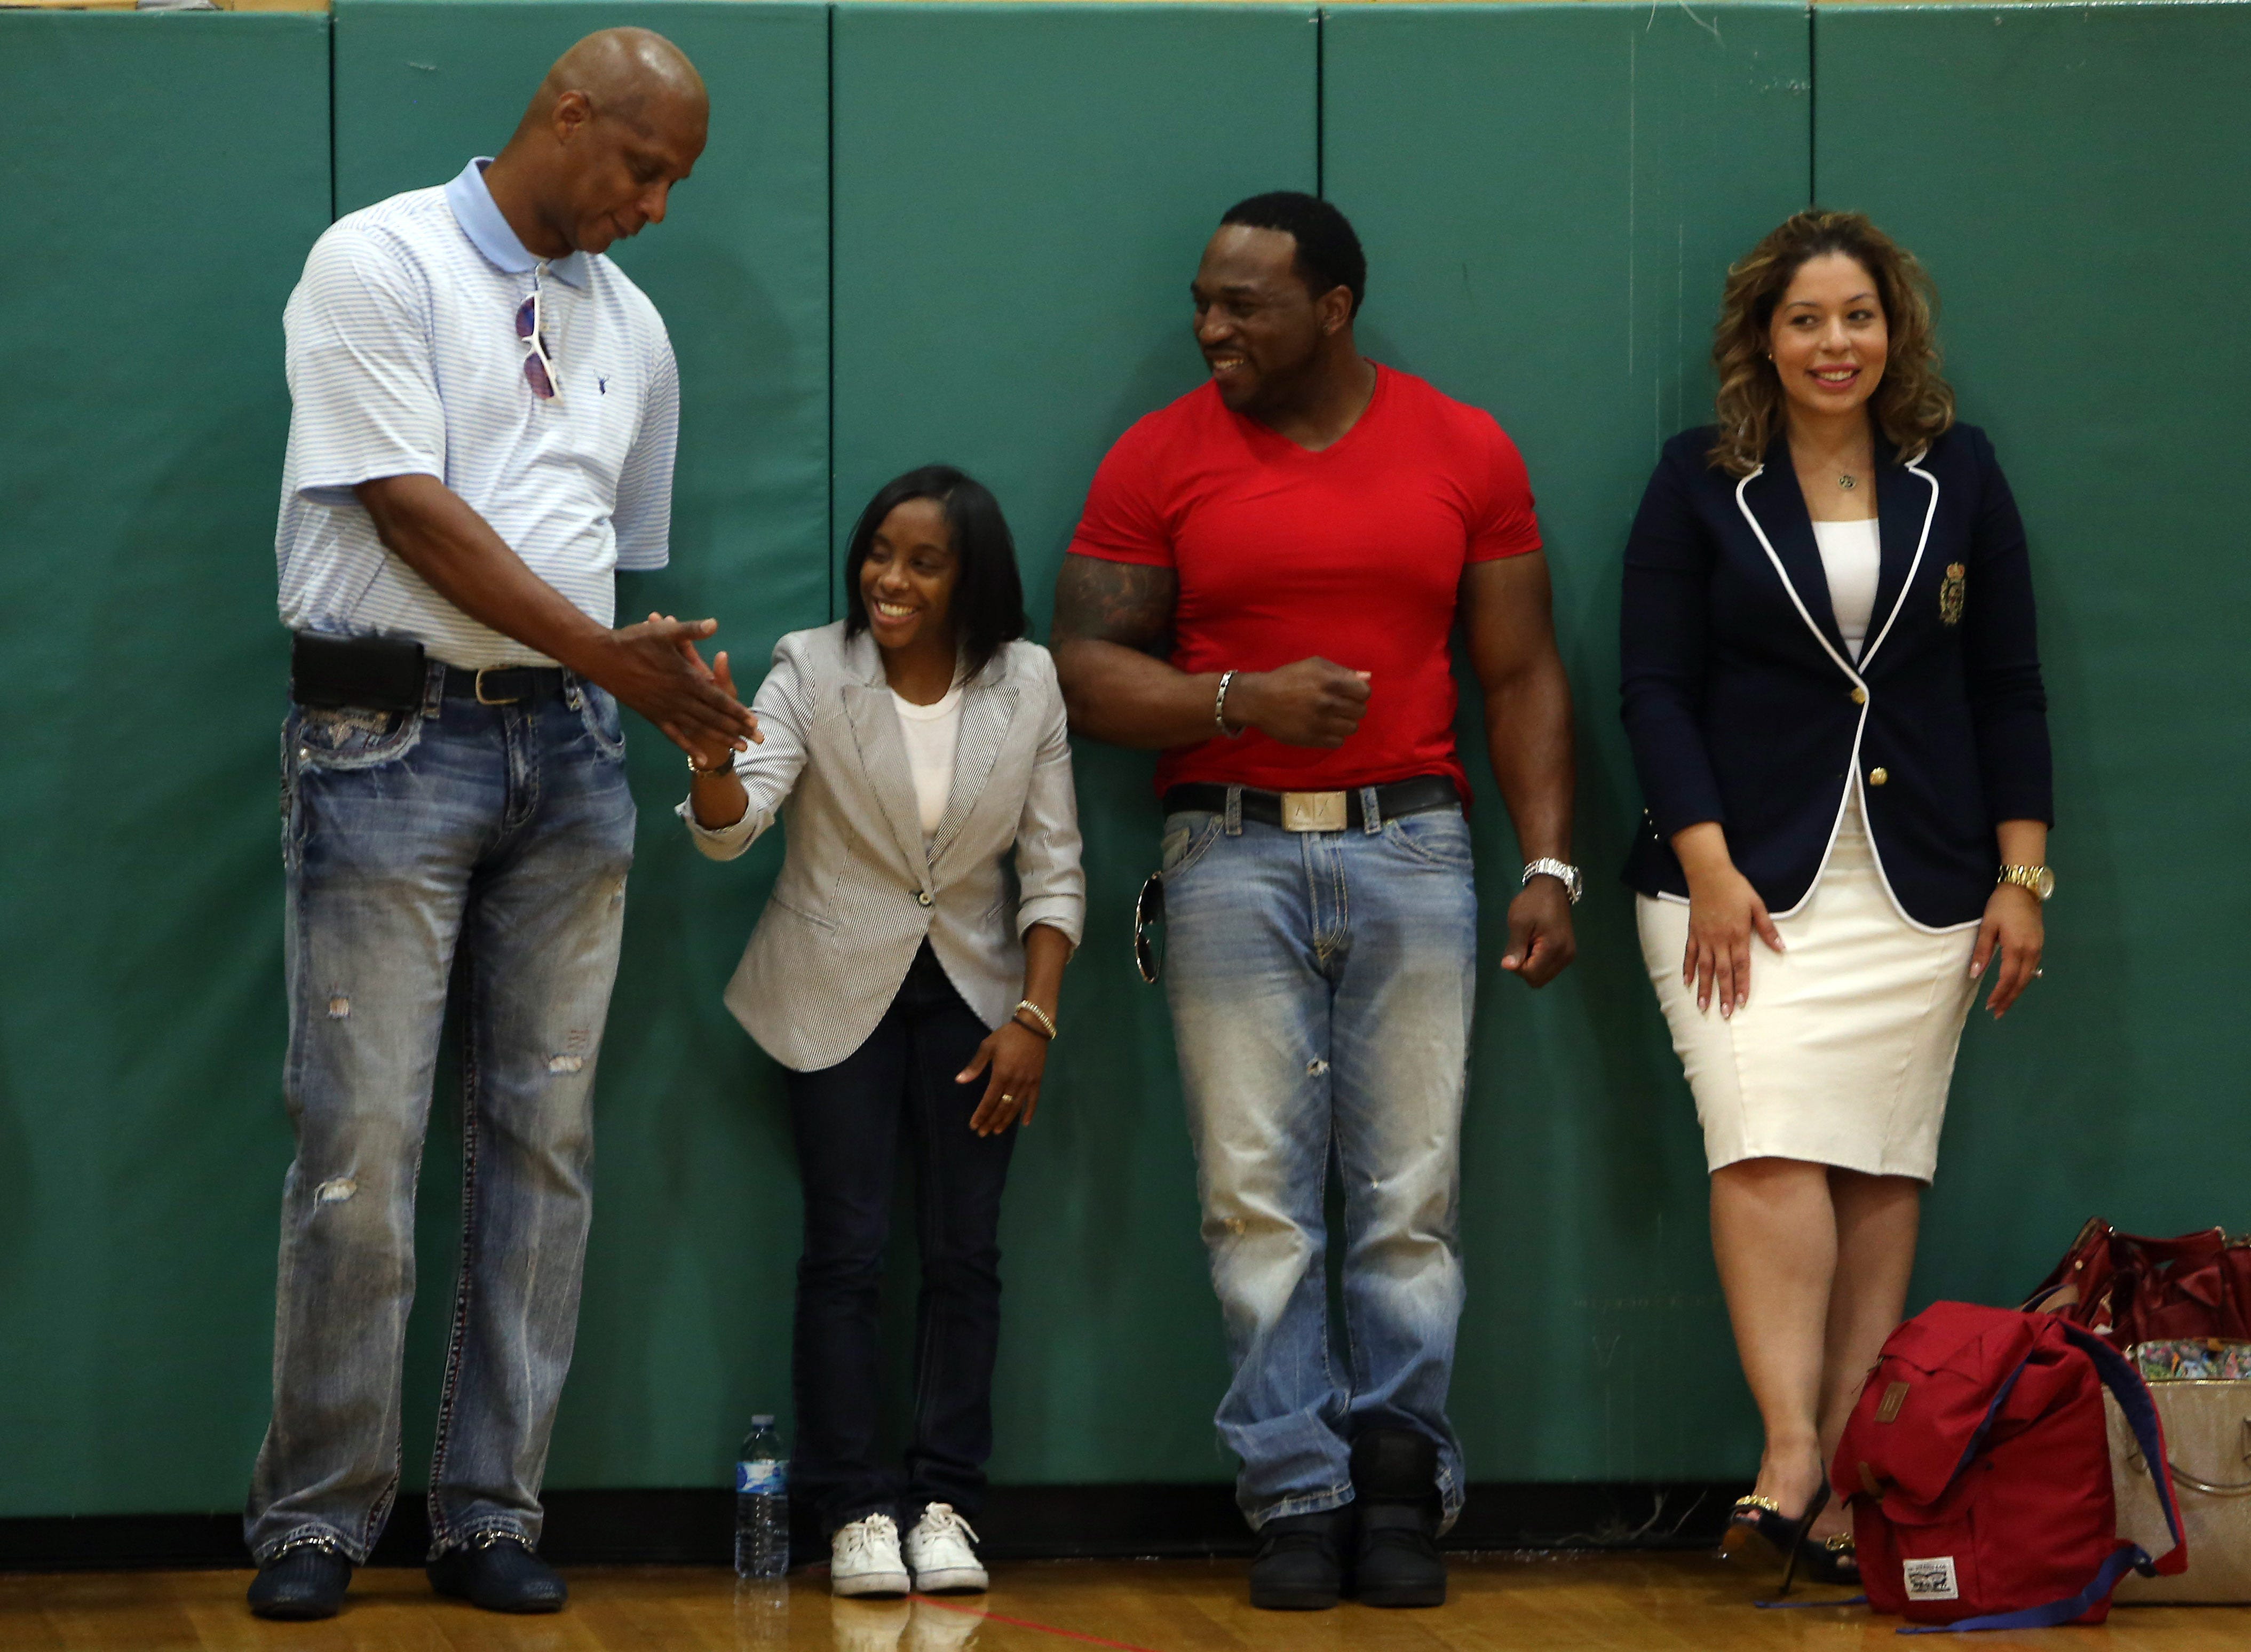 "College basketball star 4' 6"" Tiffara Steward get a high-five from former Major League Baseball right fielder Darryl Strawberry during the Rockaway Township Substance Abuse Alliance's annual Celebrity Day at Copeland Middle School. June 7, 2016, Rockaway, NJ"